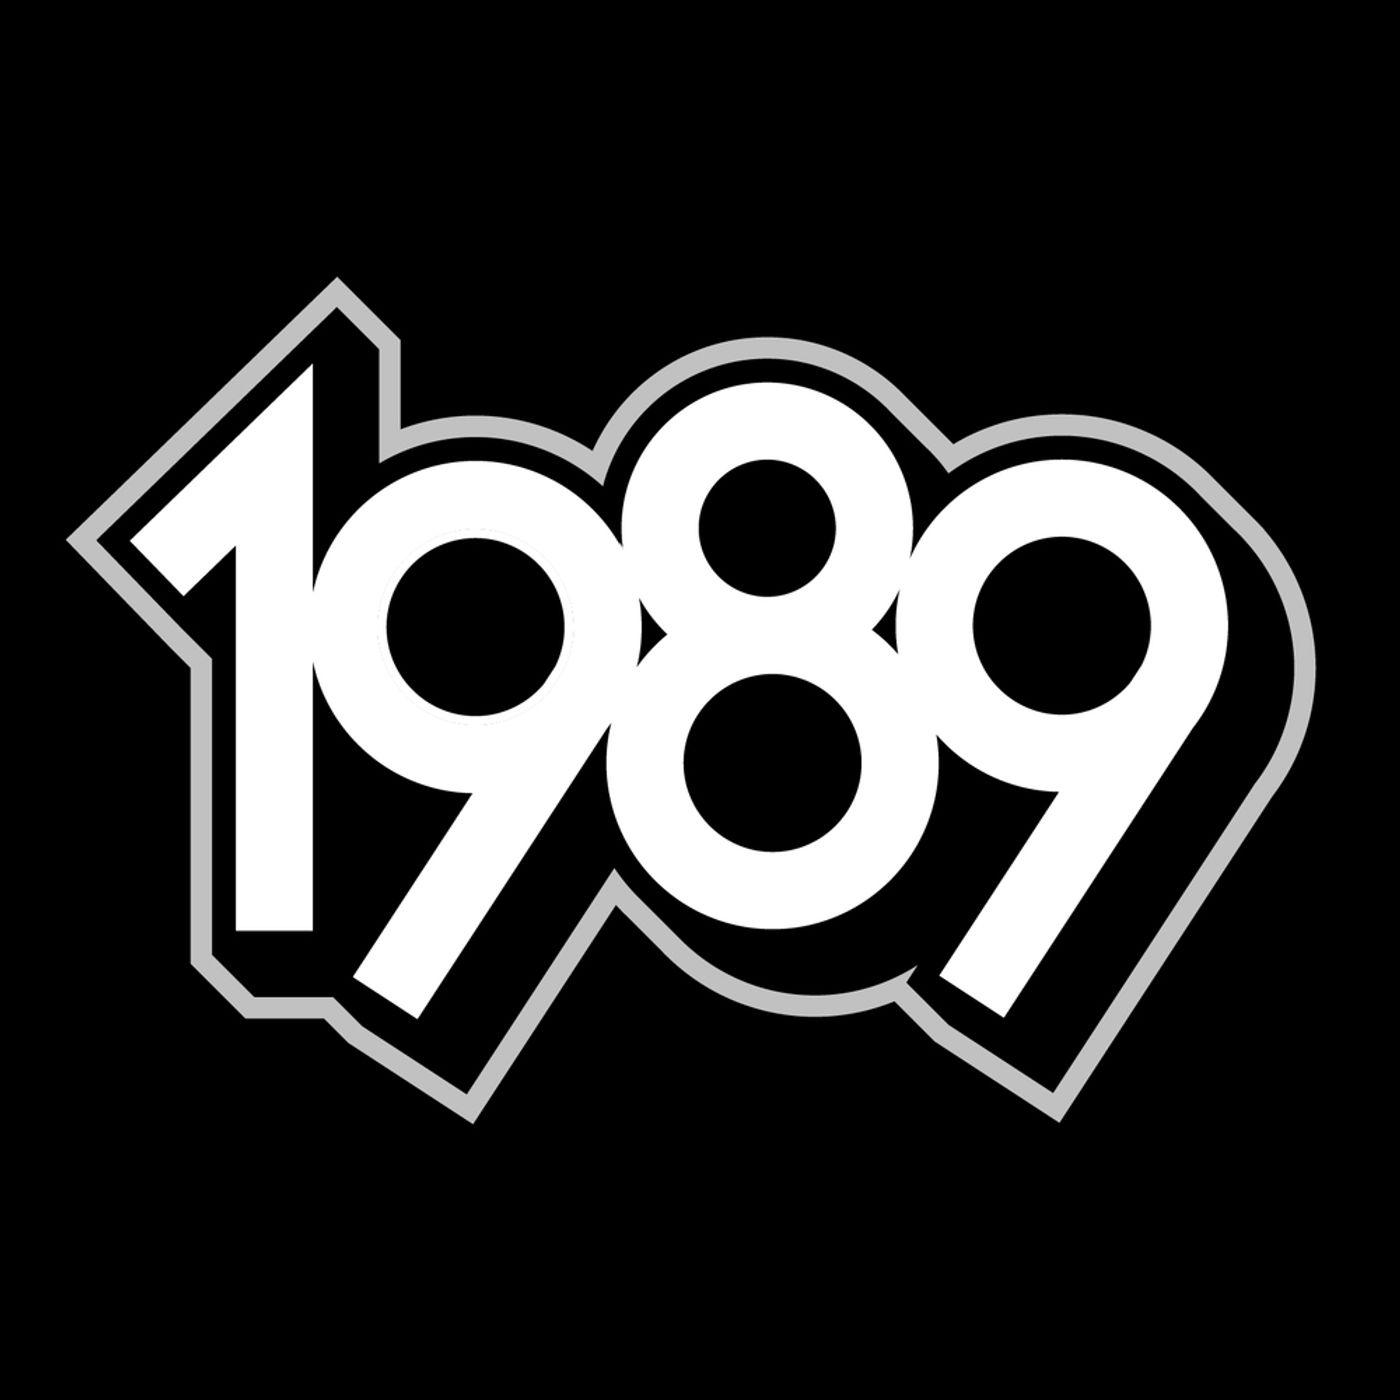 Reelin' 4-28-1989